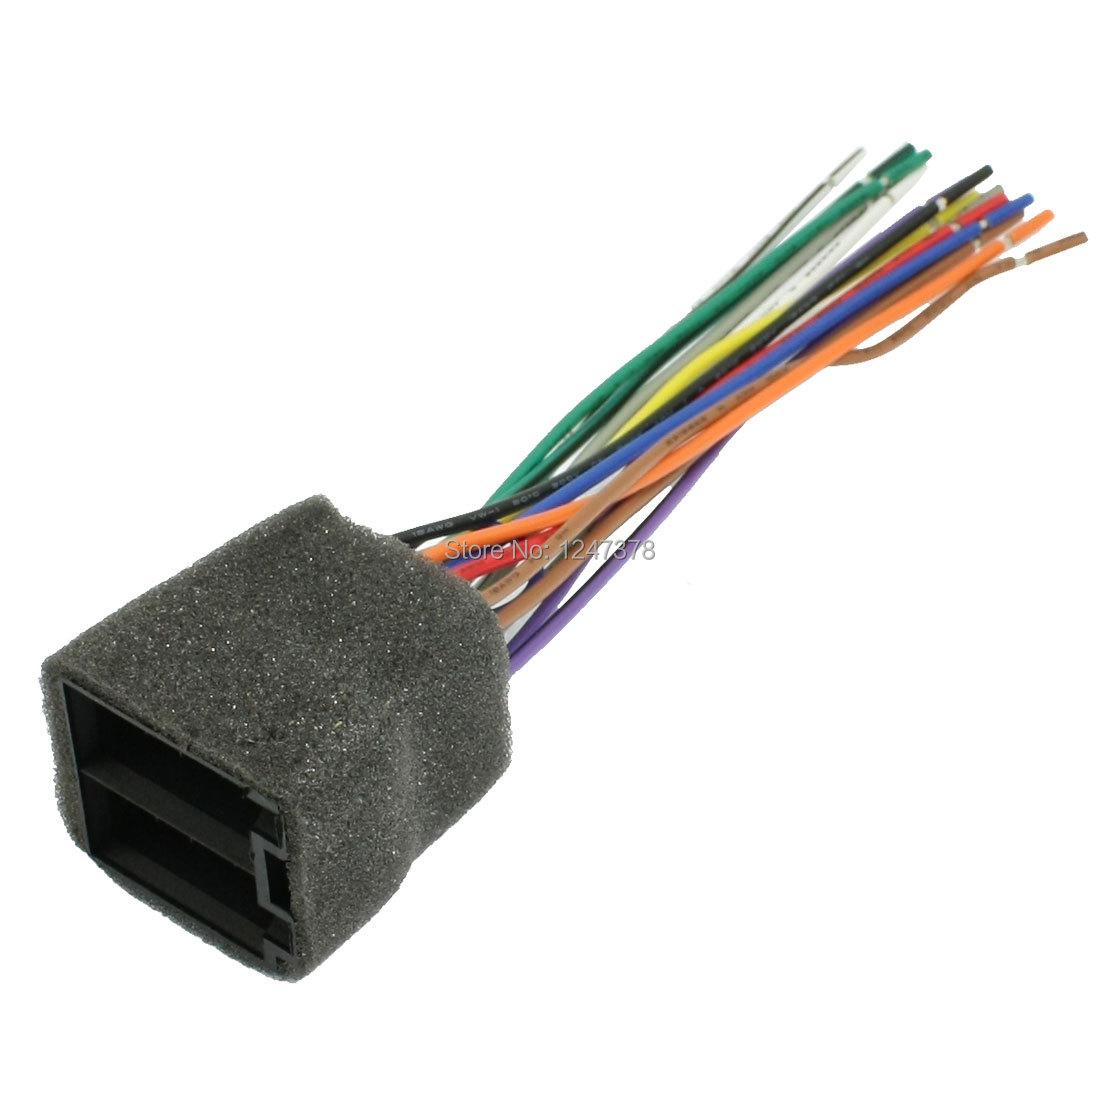 Car DVD Navigation Wiring Harness Connector for Volkswagen Passat B5<br><br>Aliexpress